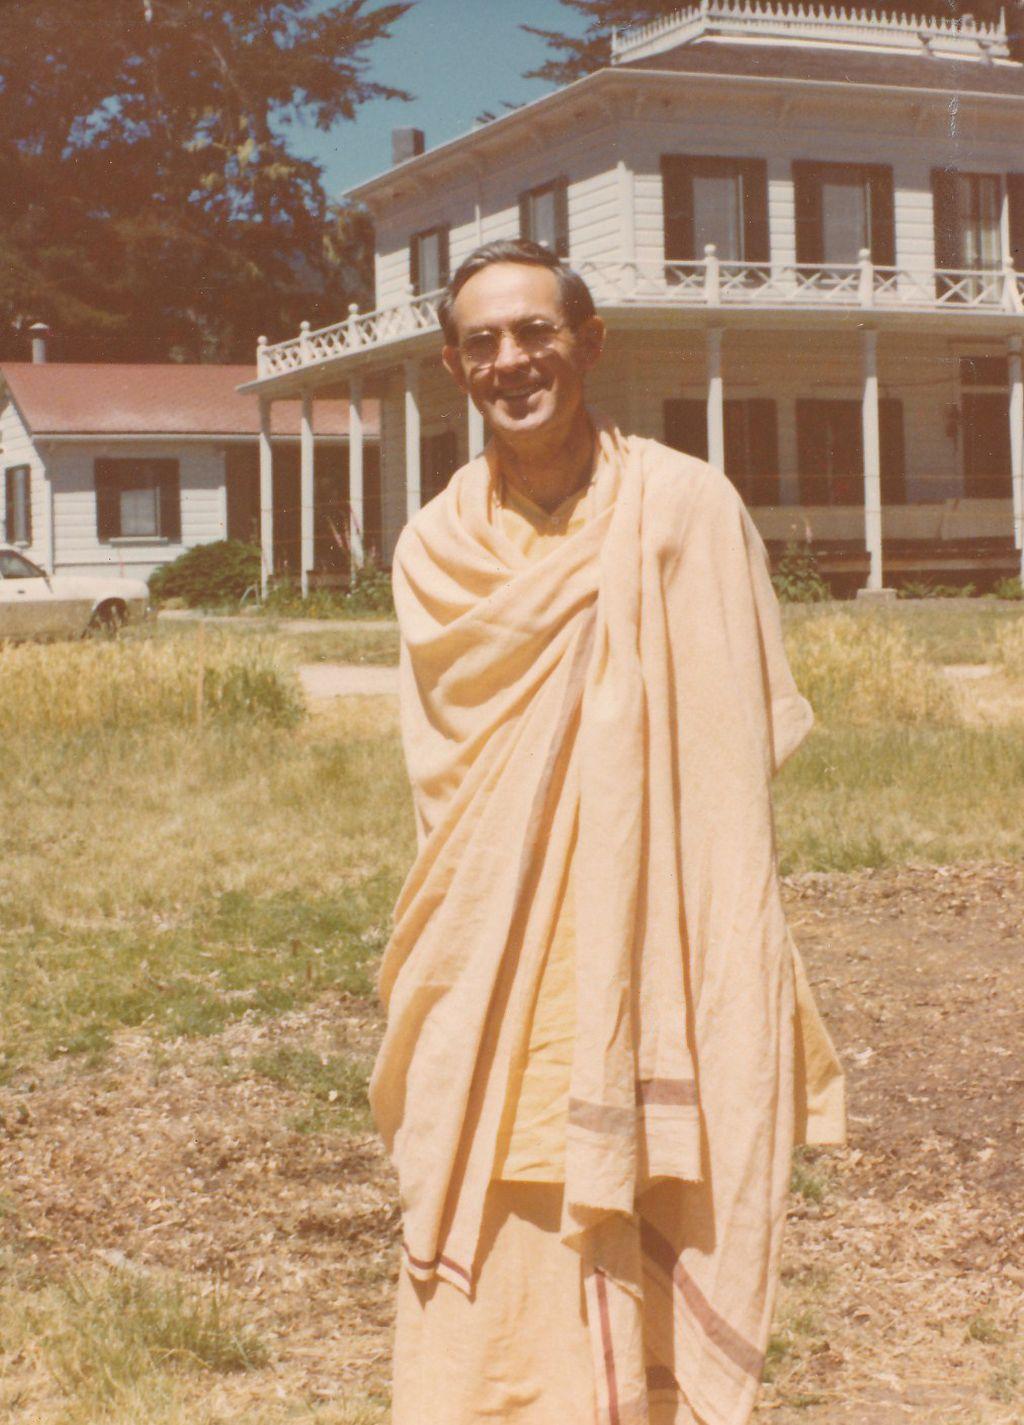 Swami Bhaktimayananda in Olema